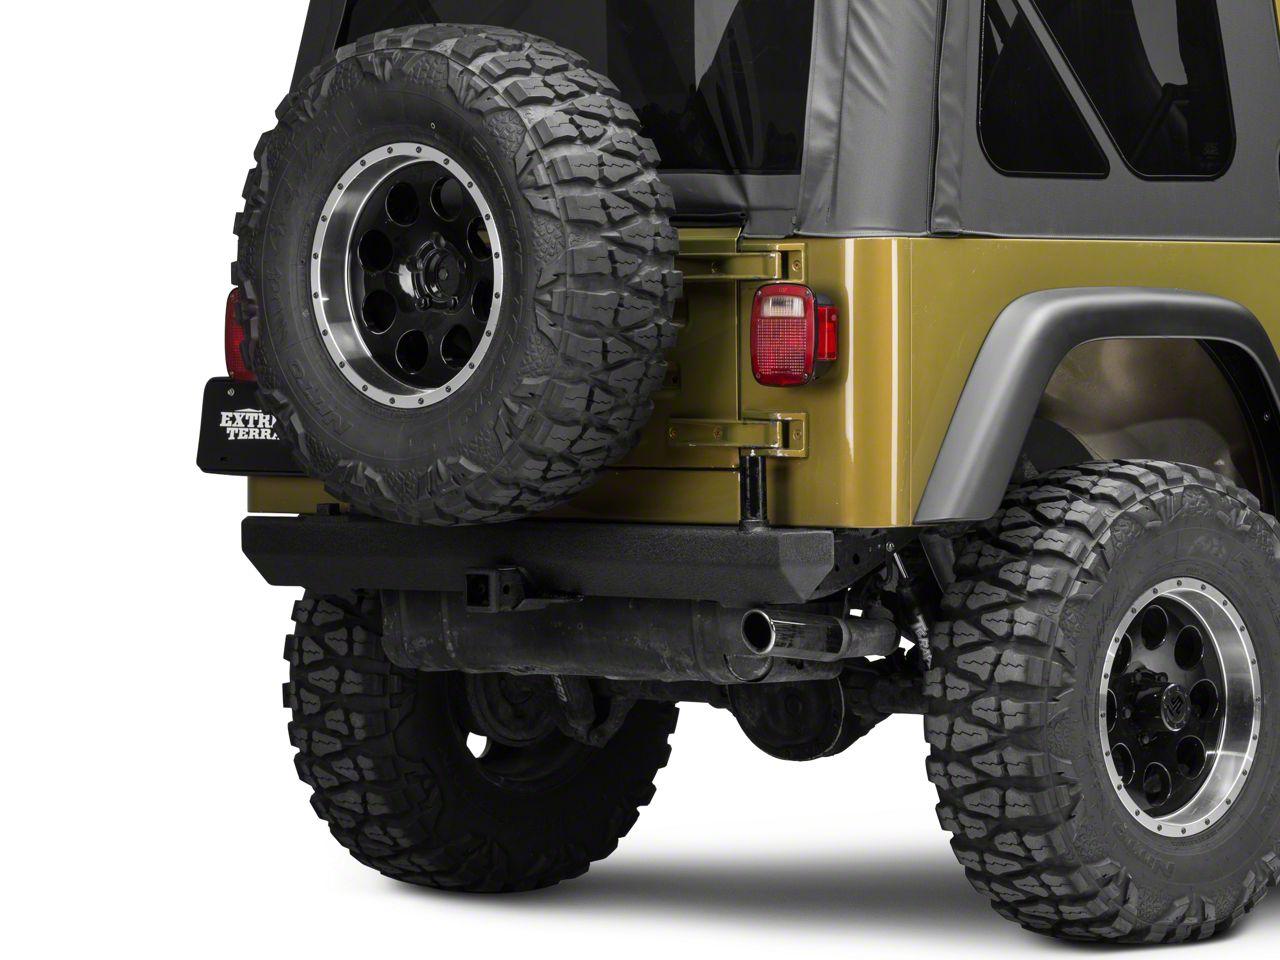 Smittybilt SRC Classic Rear Bumper - Textured Black (87-06 Jeep Wrangler YJ & TJ)